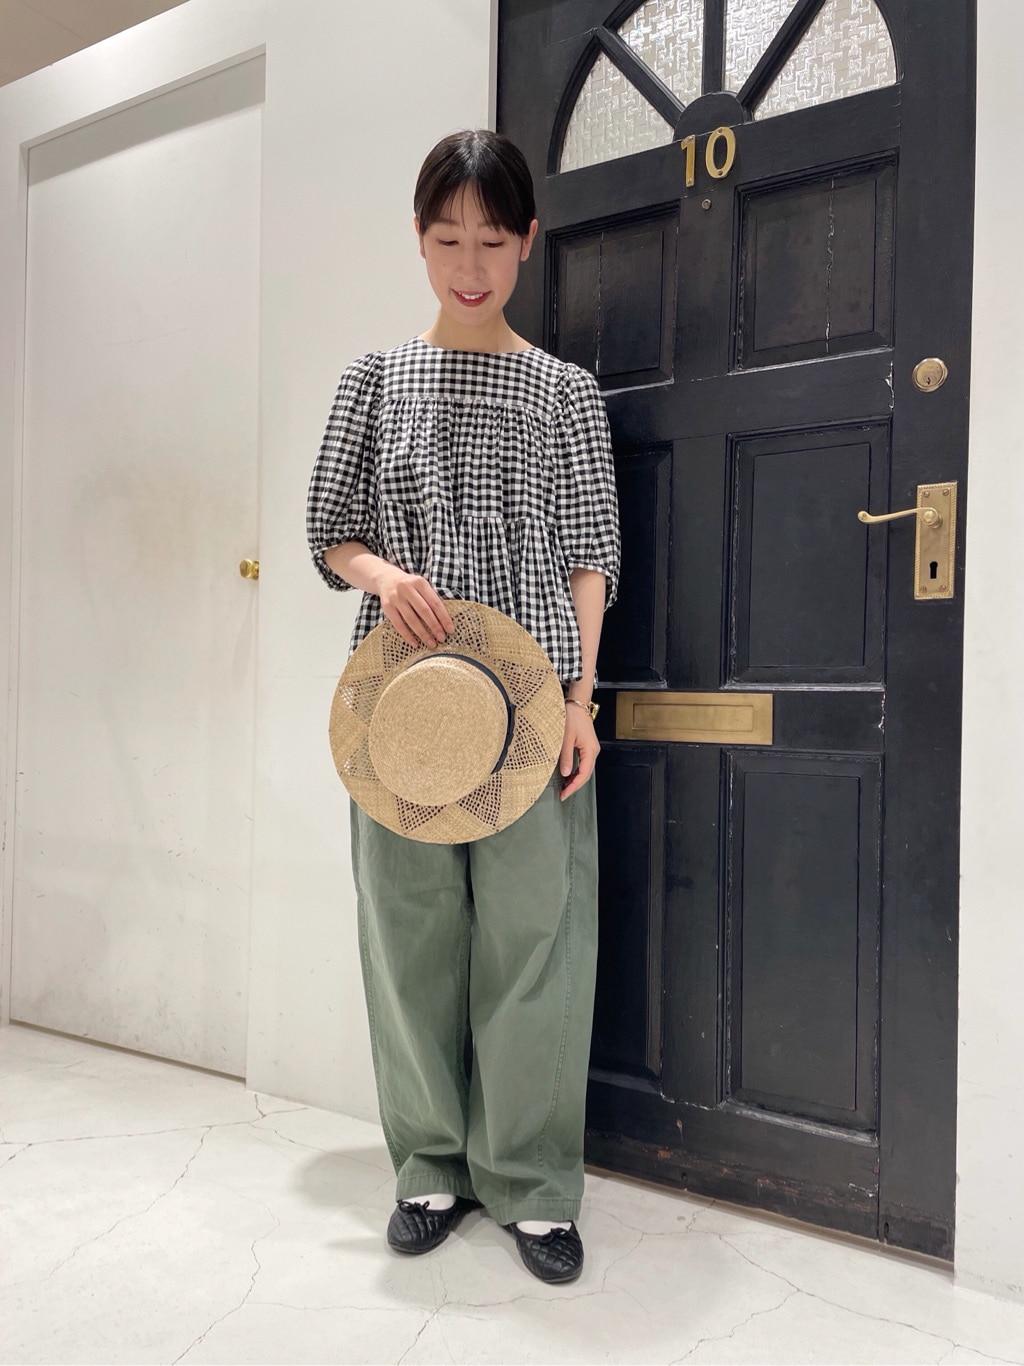 Dot and Stripes CHILD WOMAN ルクアイーレ 身長:151cm 2021.04.16